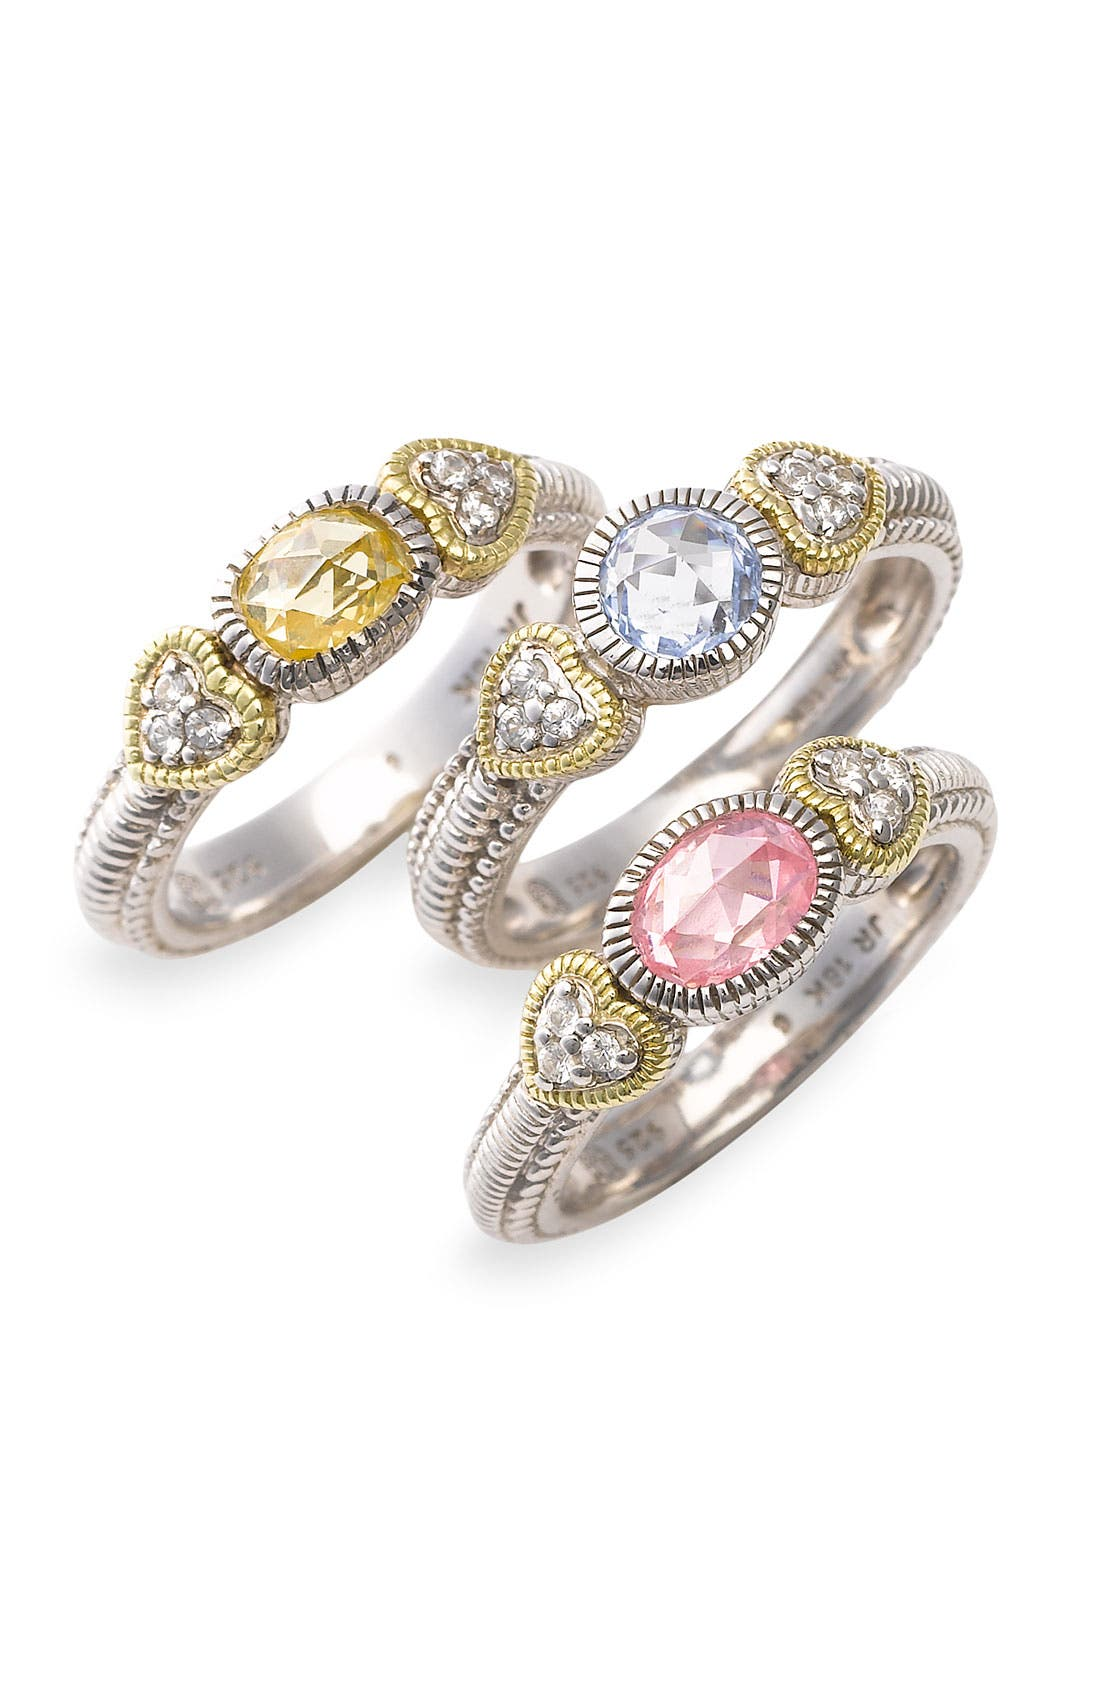 Main Image - Judith Ripka 'Ambrosia' Semiprecious Ring